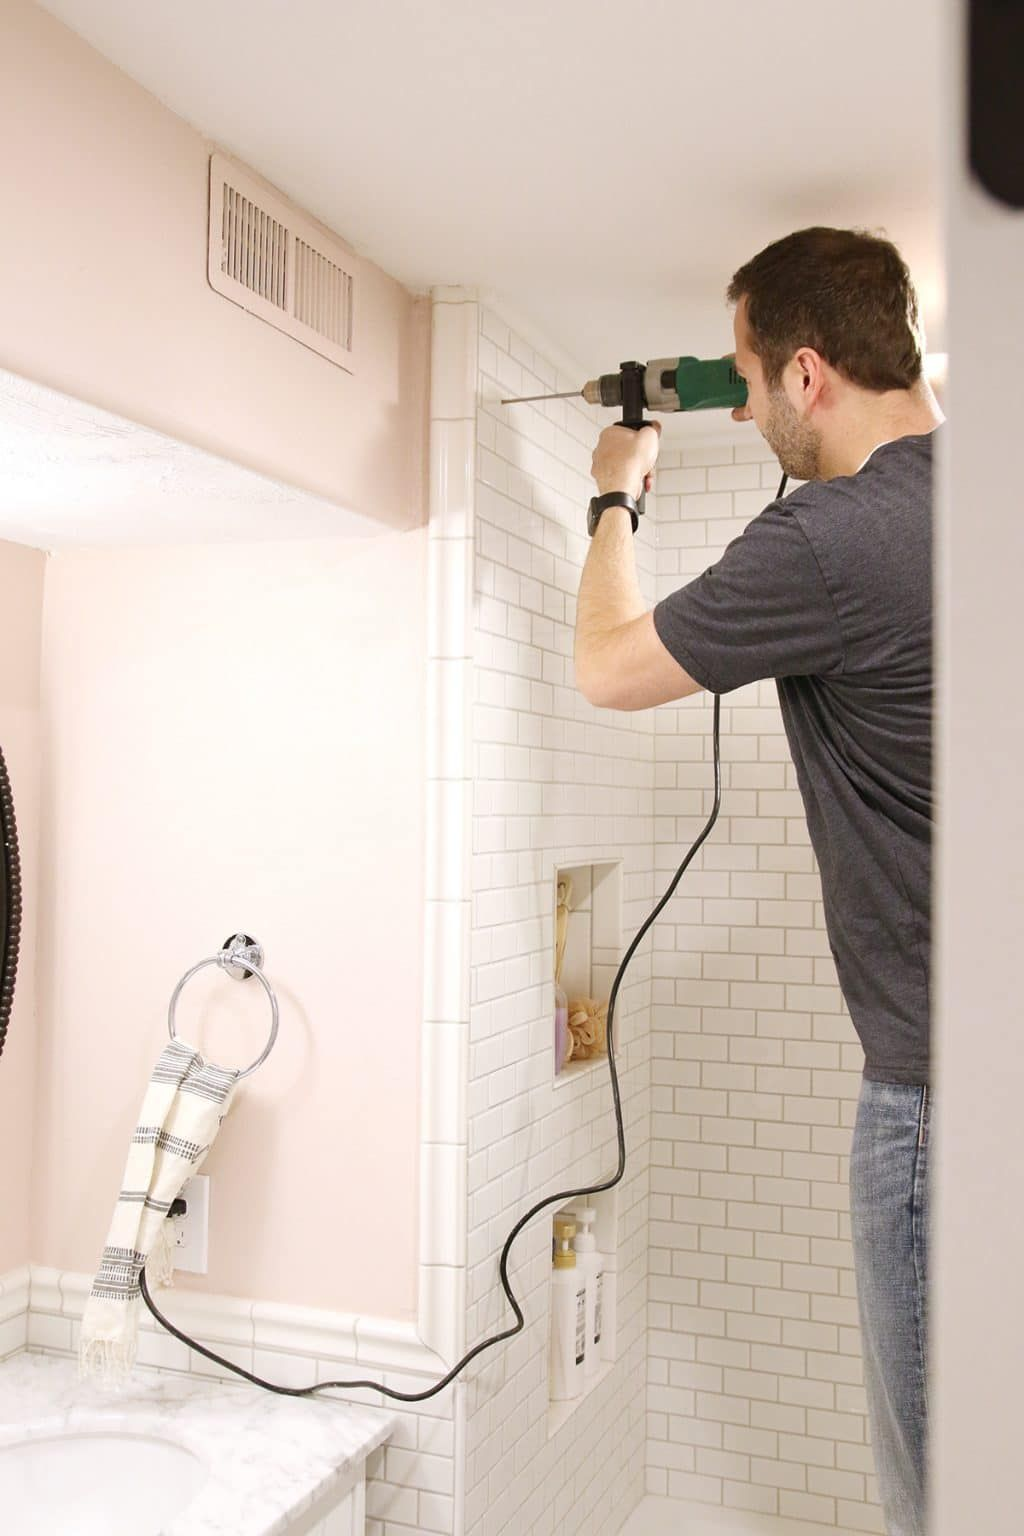 How to Drill Holes in Porcelain Bathroom Tile Porcelain